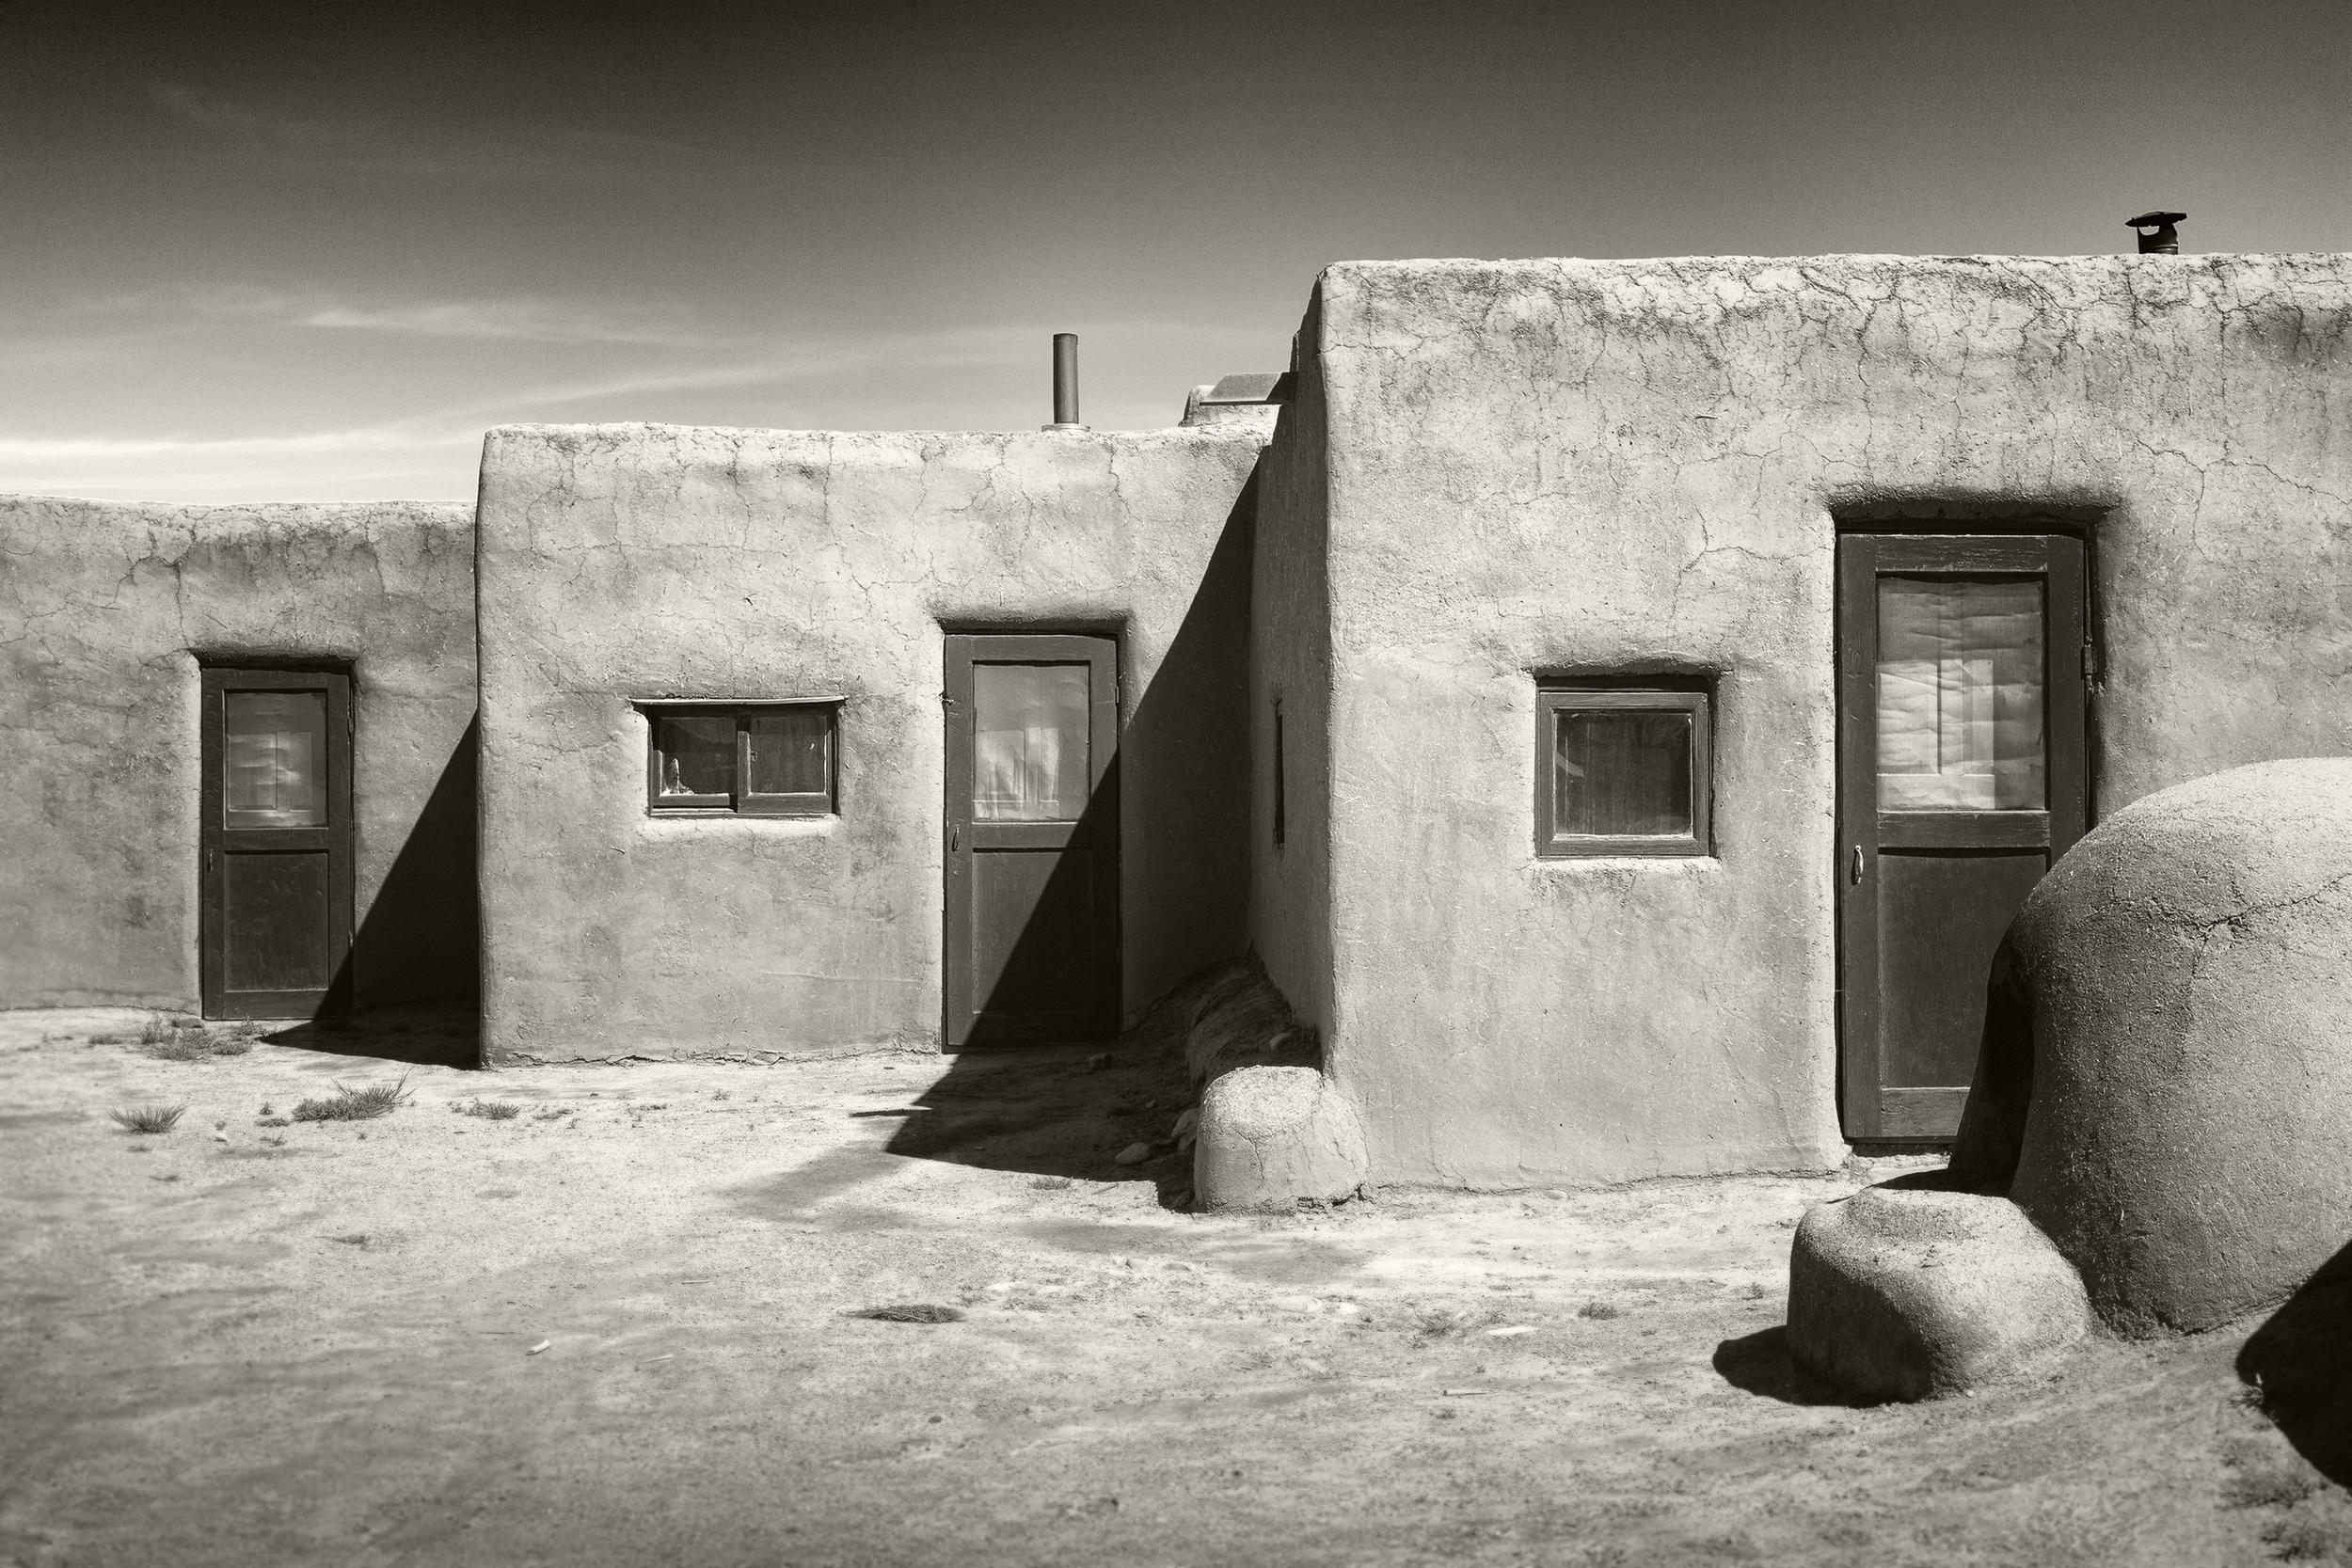 Taos Mission Doors